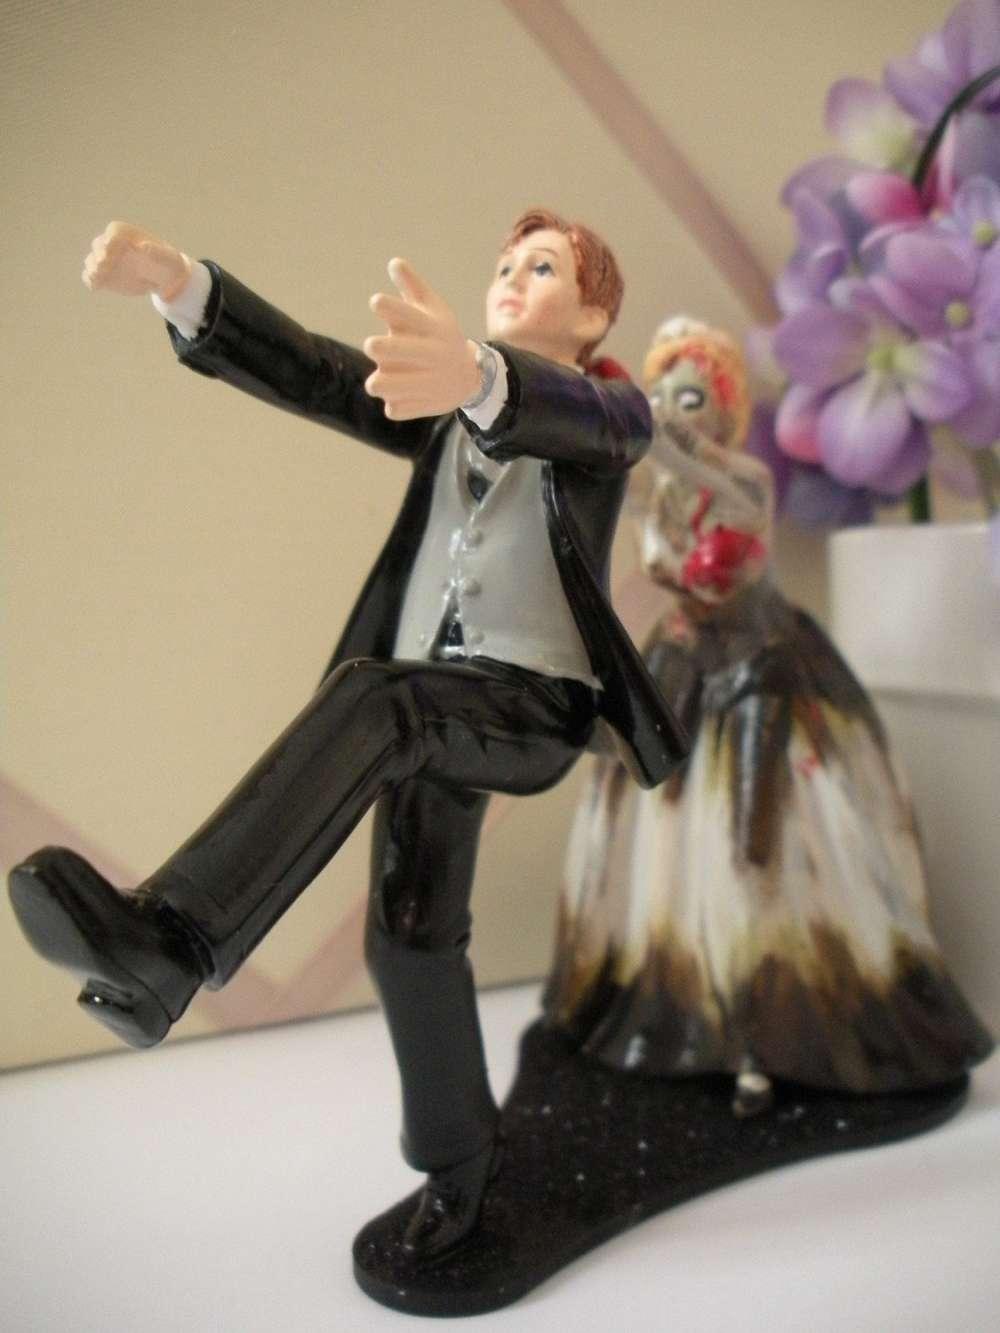 Zombie Wedding Cake Topper DudeIWantThatcom